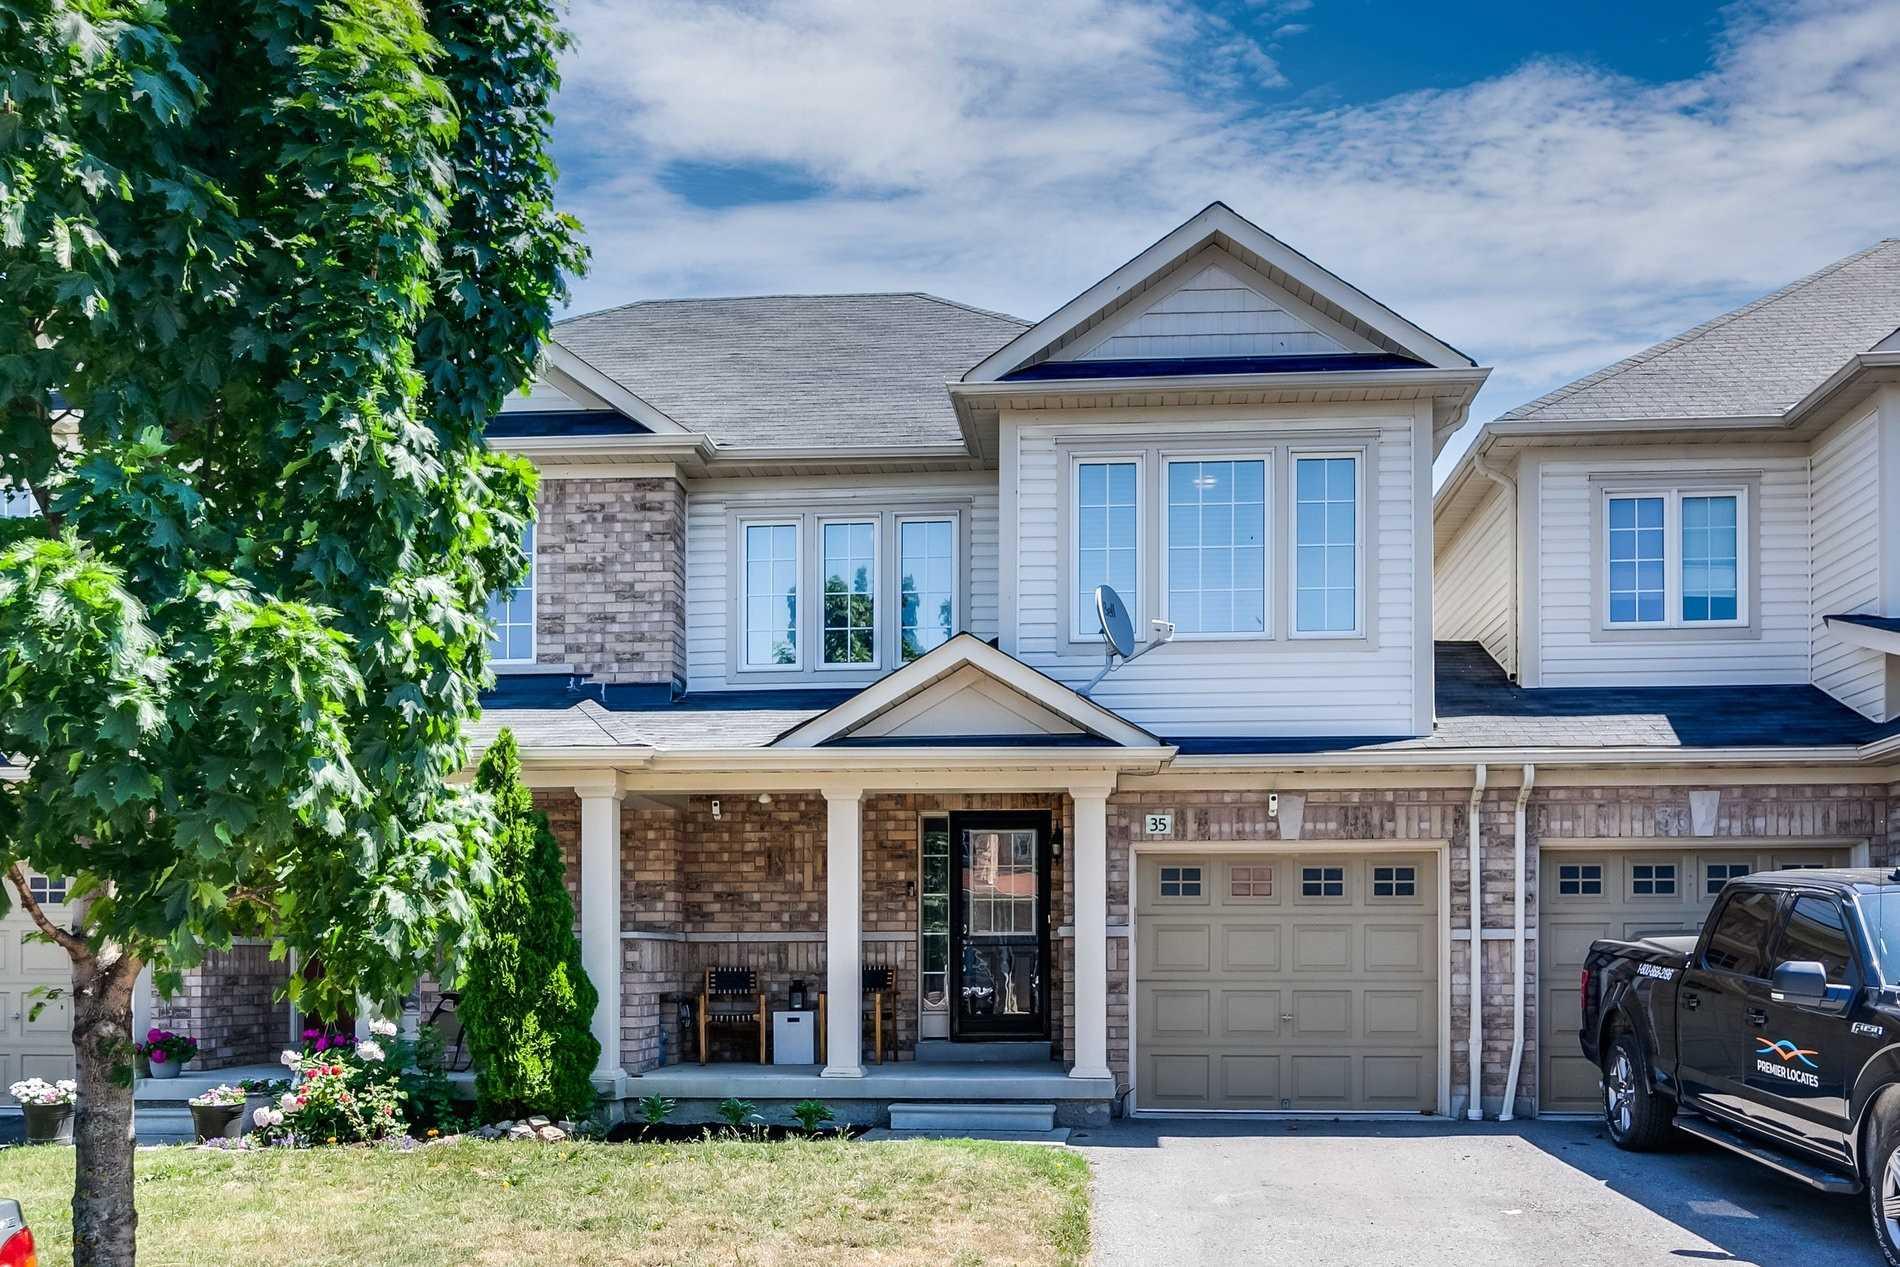 35 Booker Dr, Ajax, Ontario L1Z0H4, 3 Bedrooms Bedrooms, ,3 BathroomsBathrooms,Att/row/twnhouse,For Sale,Booker,E5273635